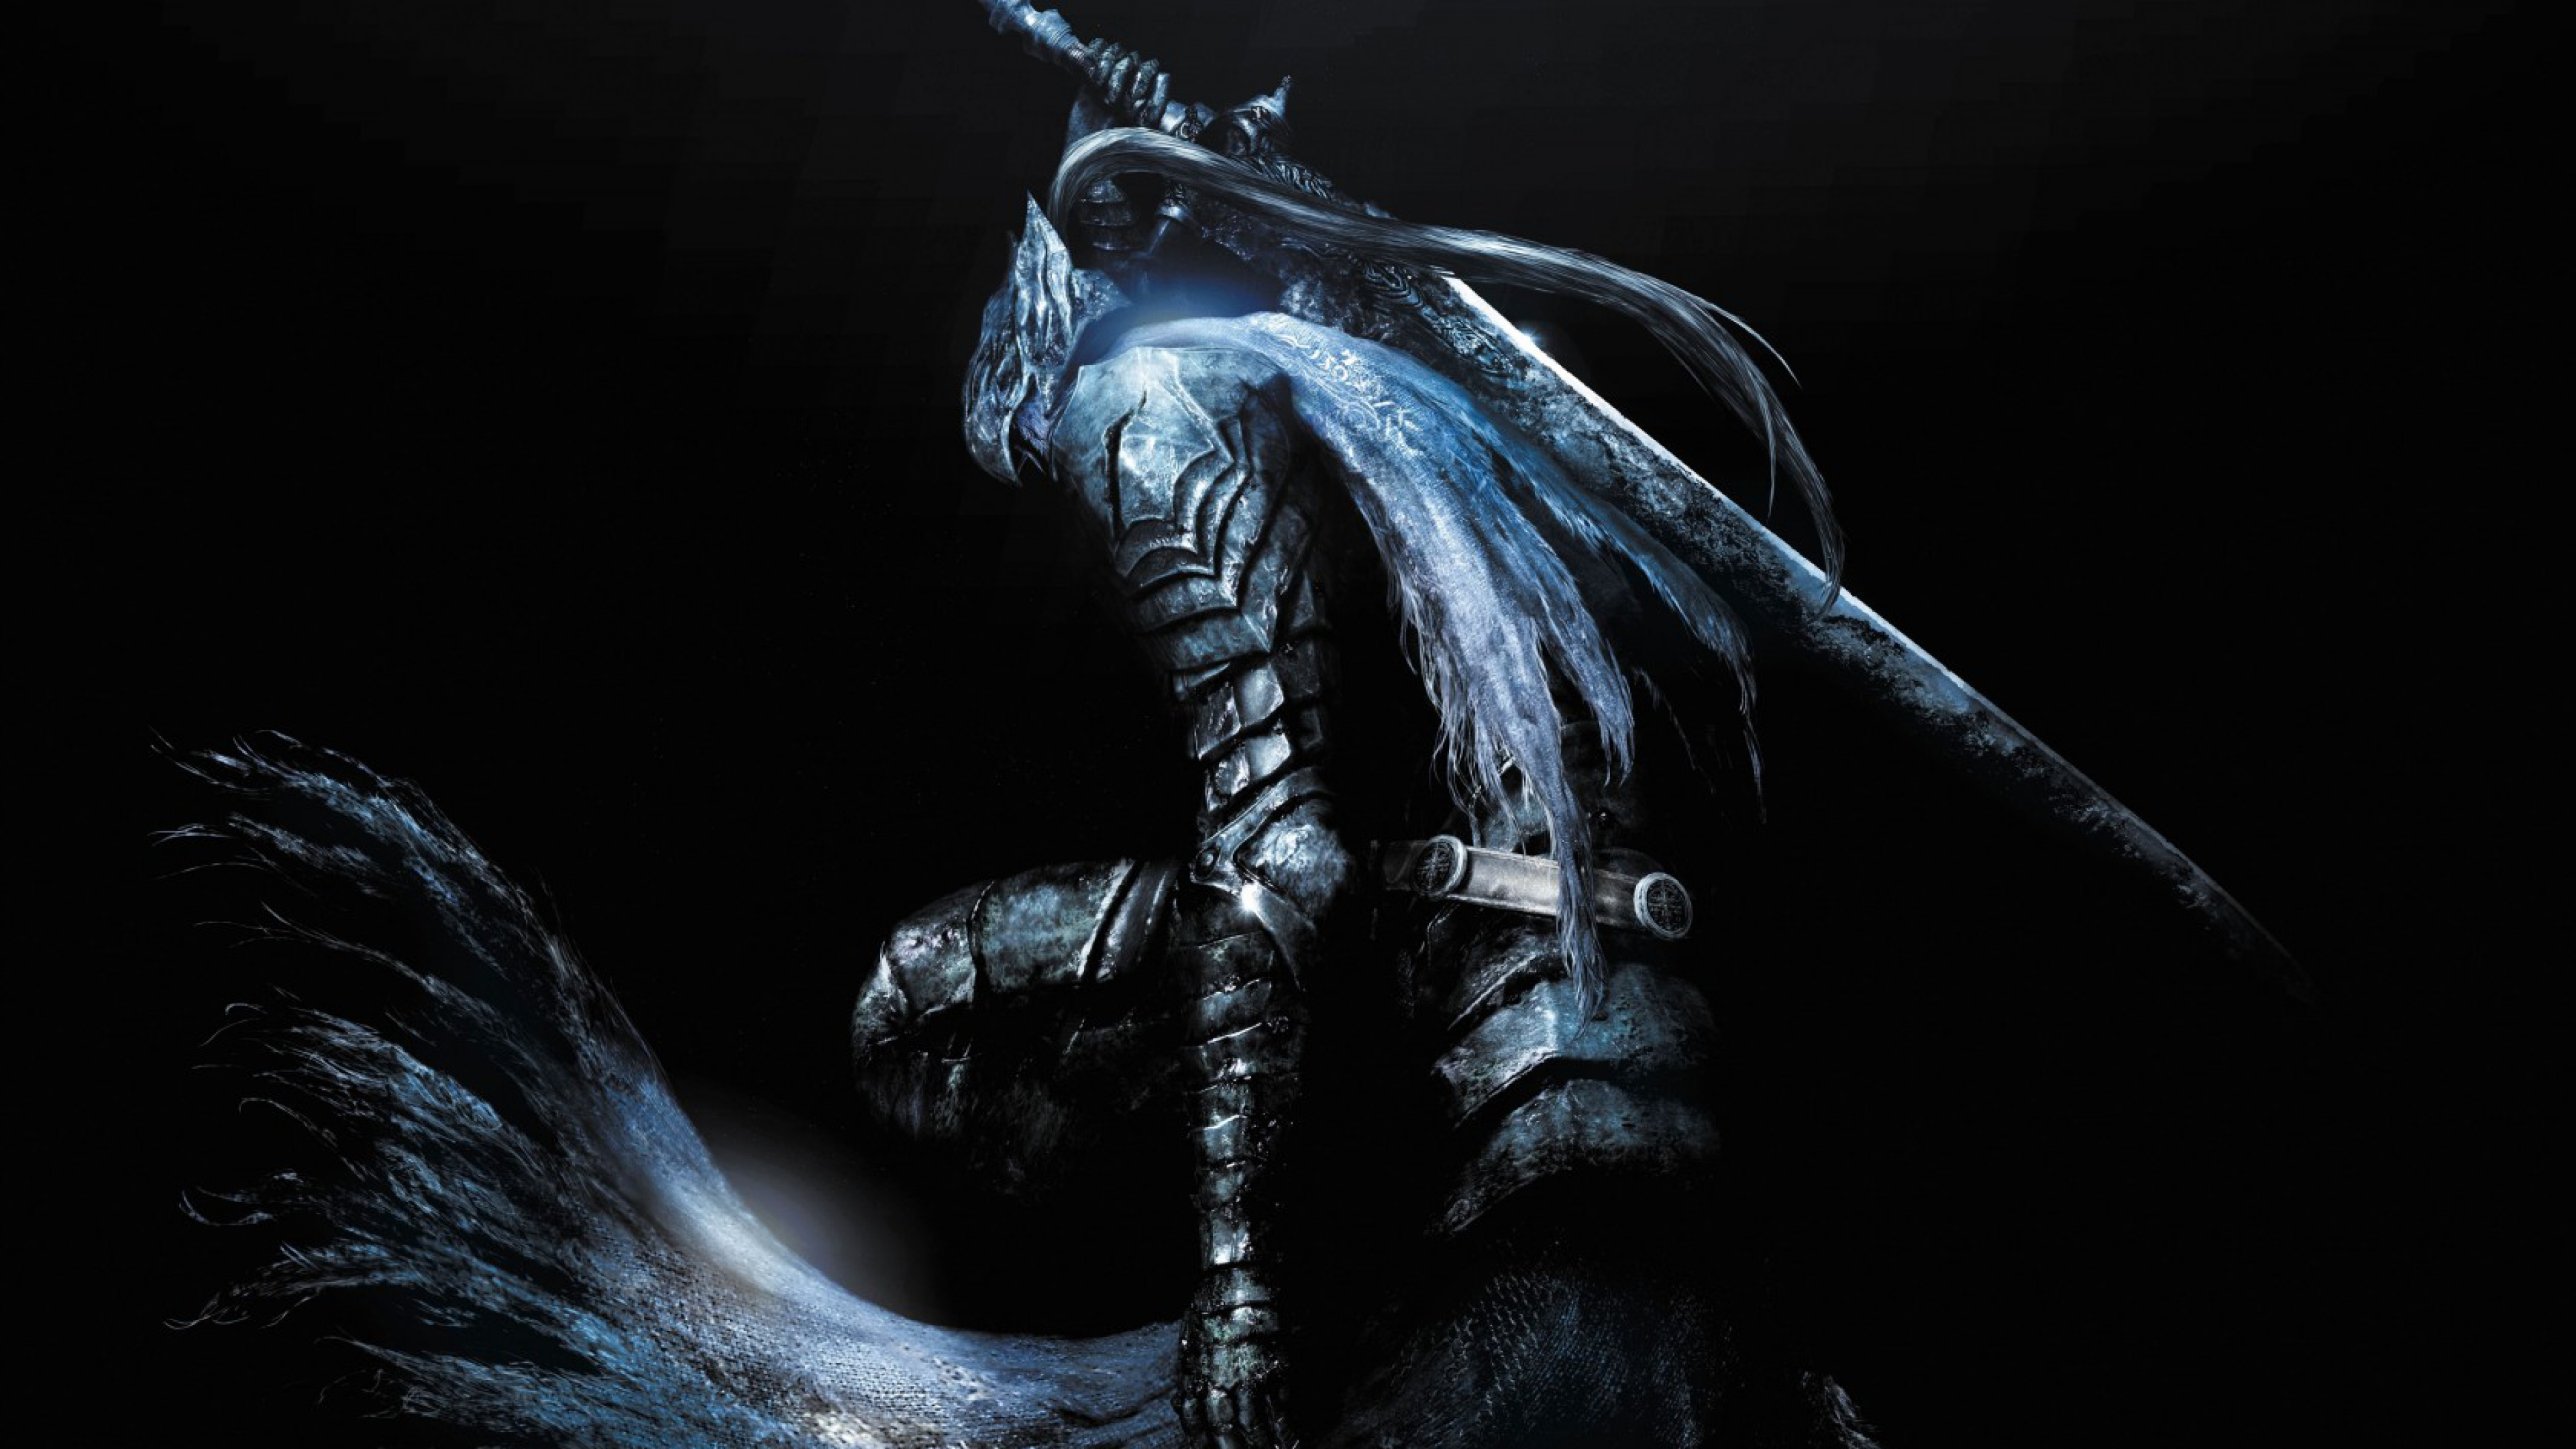 2560x1440 Dark Souls 3 Pc Game 1440p Resolution Hd 4k